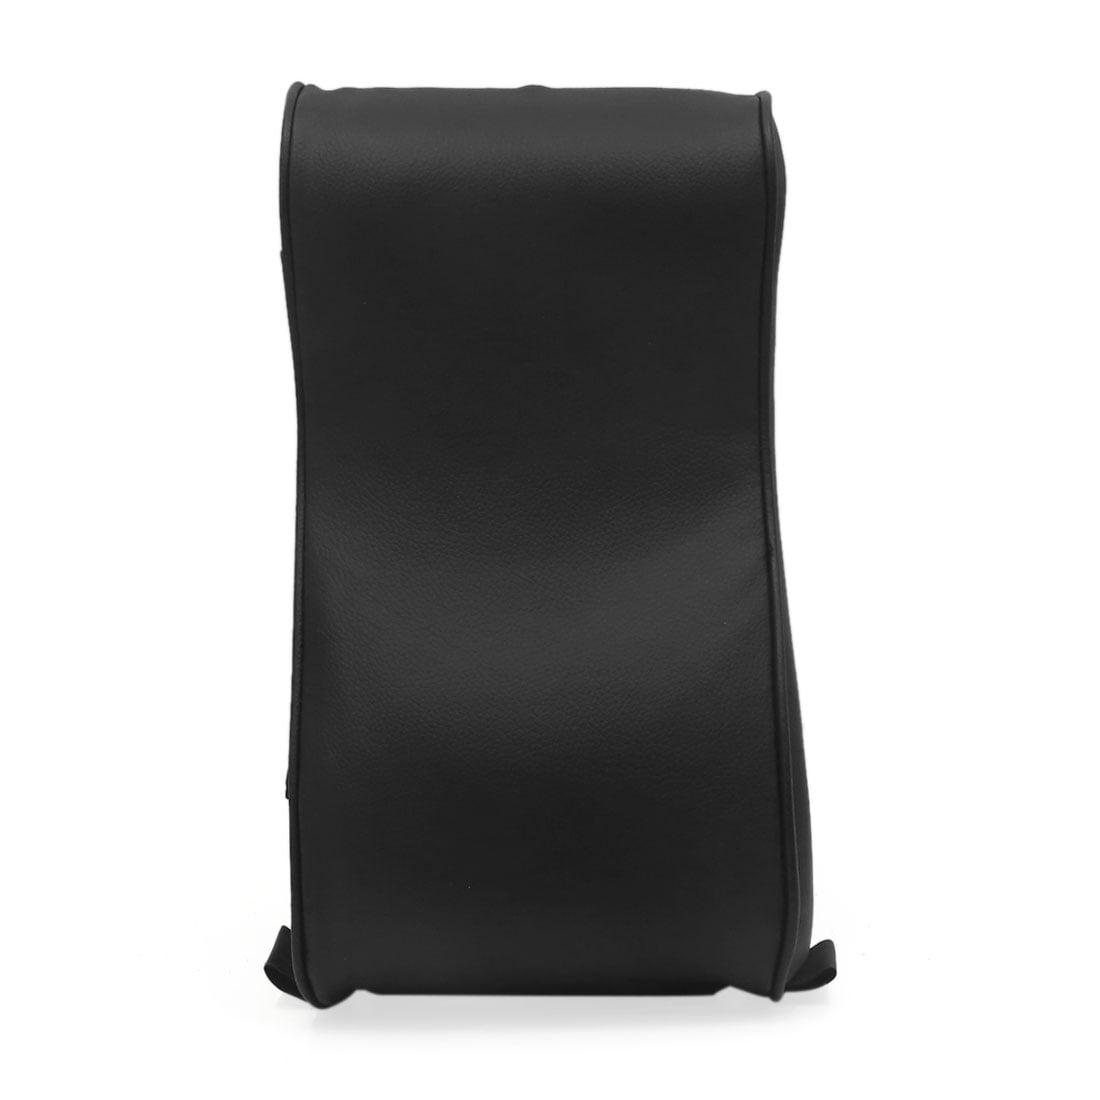 Black Faux Leather Memory Foam Car Auto Center Console Armrest Cushion Pad - image 4 of 4